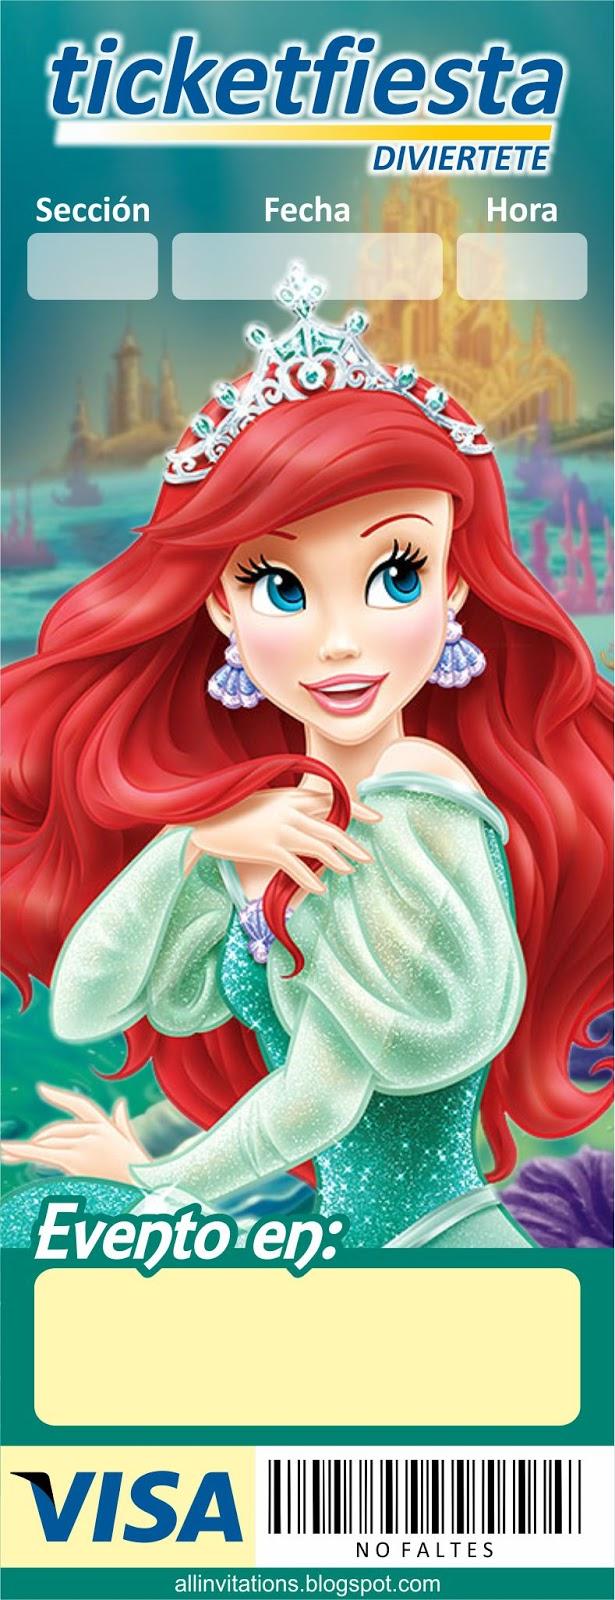 de la Princesa Ariel, personaje de la película La Sirenita de Disney